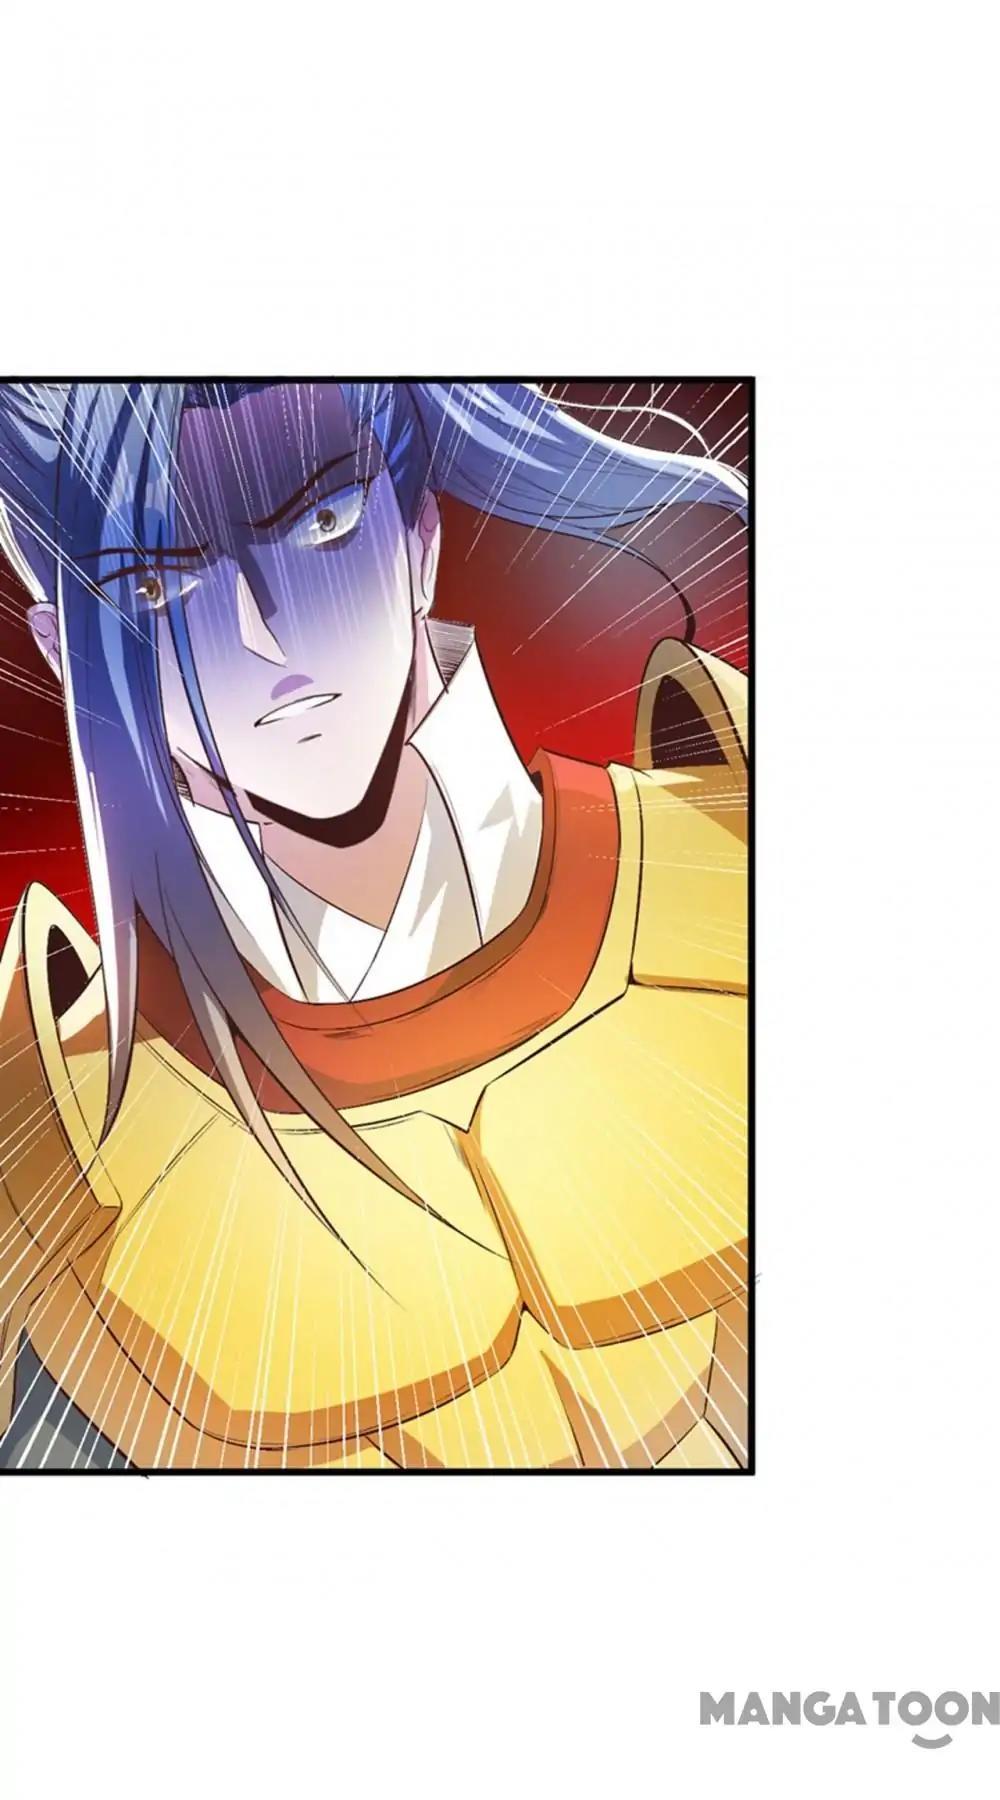 https://manga.mangadogs.com/comics/pic2/41/24169/1132736/7c1abf44854fdd13b61dc6f183ce60f8.jpg Page 1